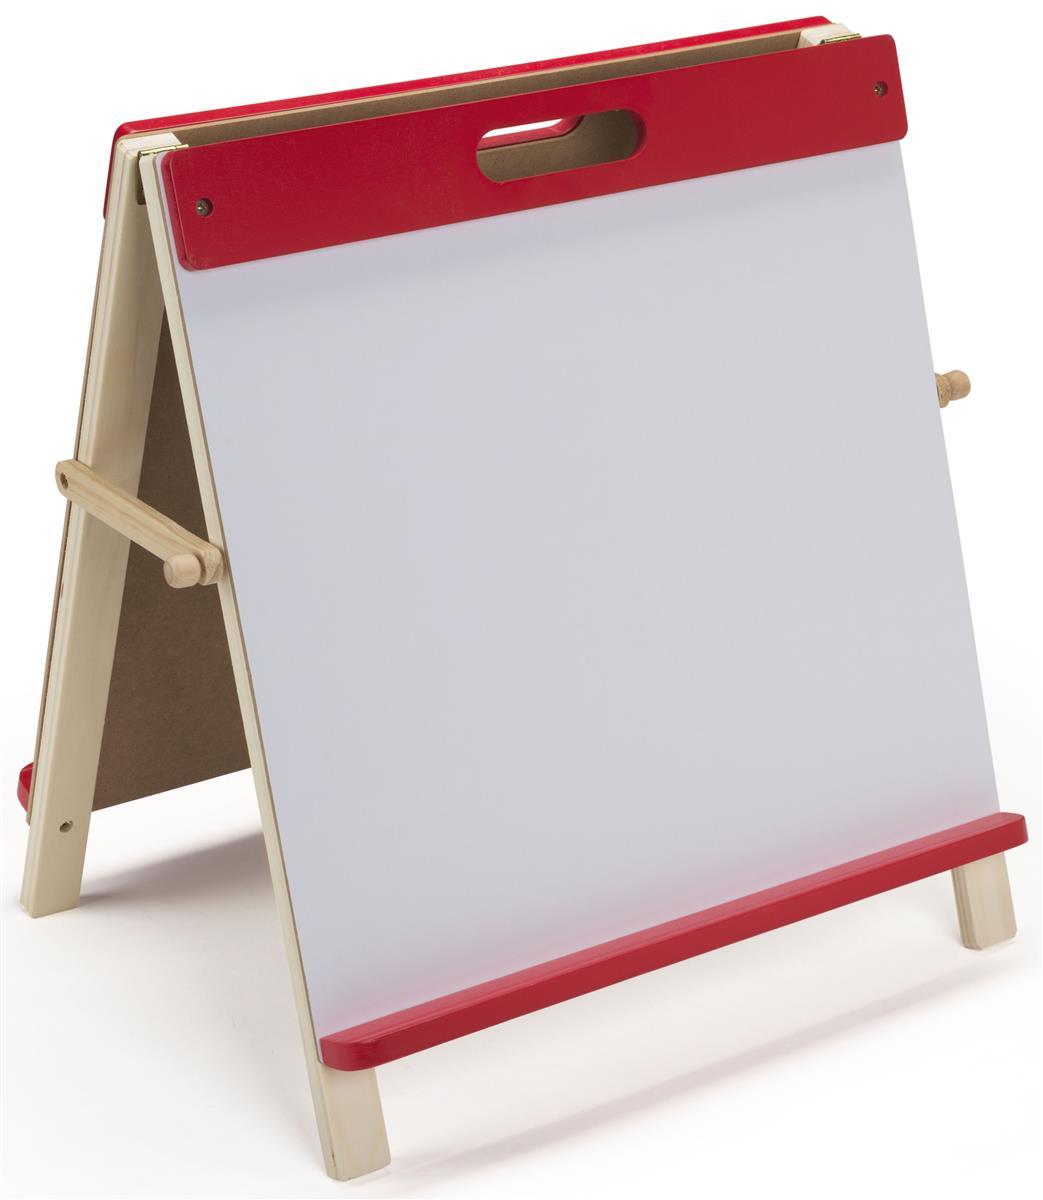 Desktop Easel For Kids Red Finish